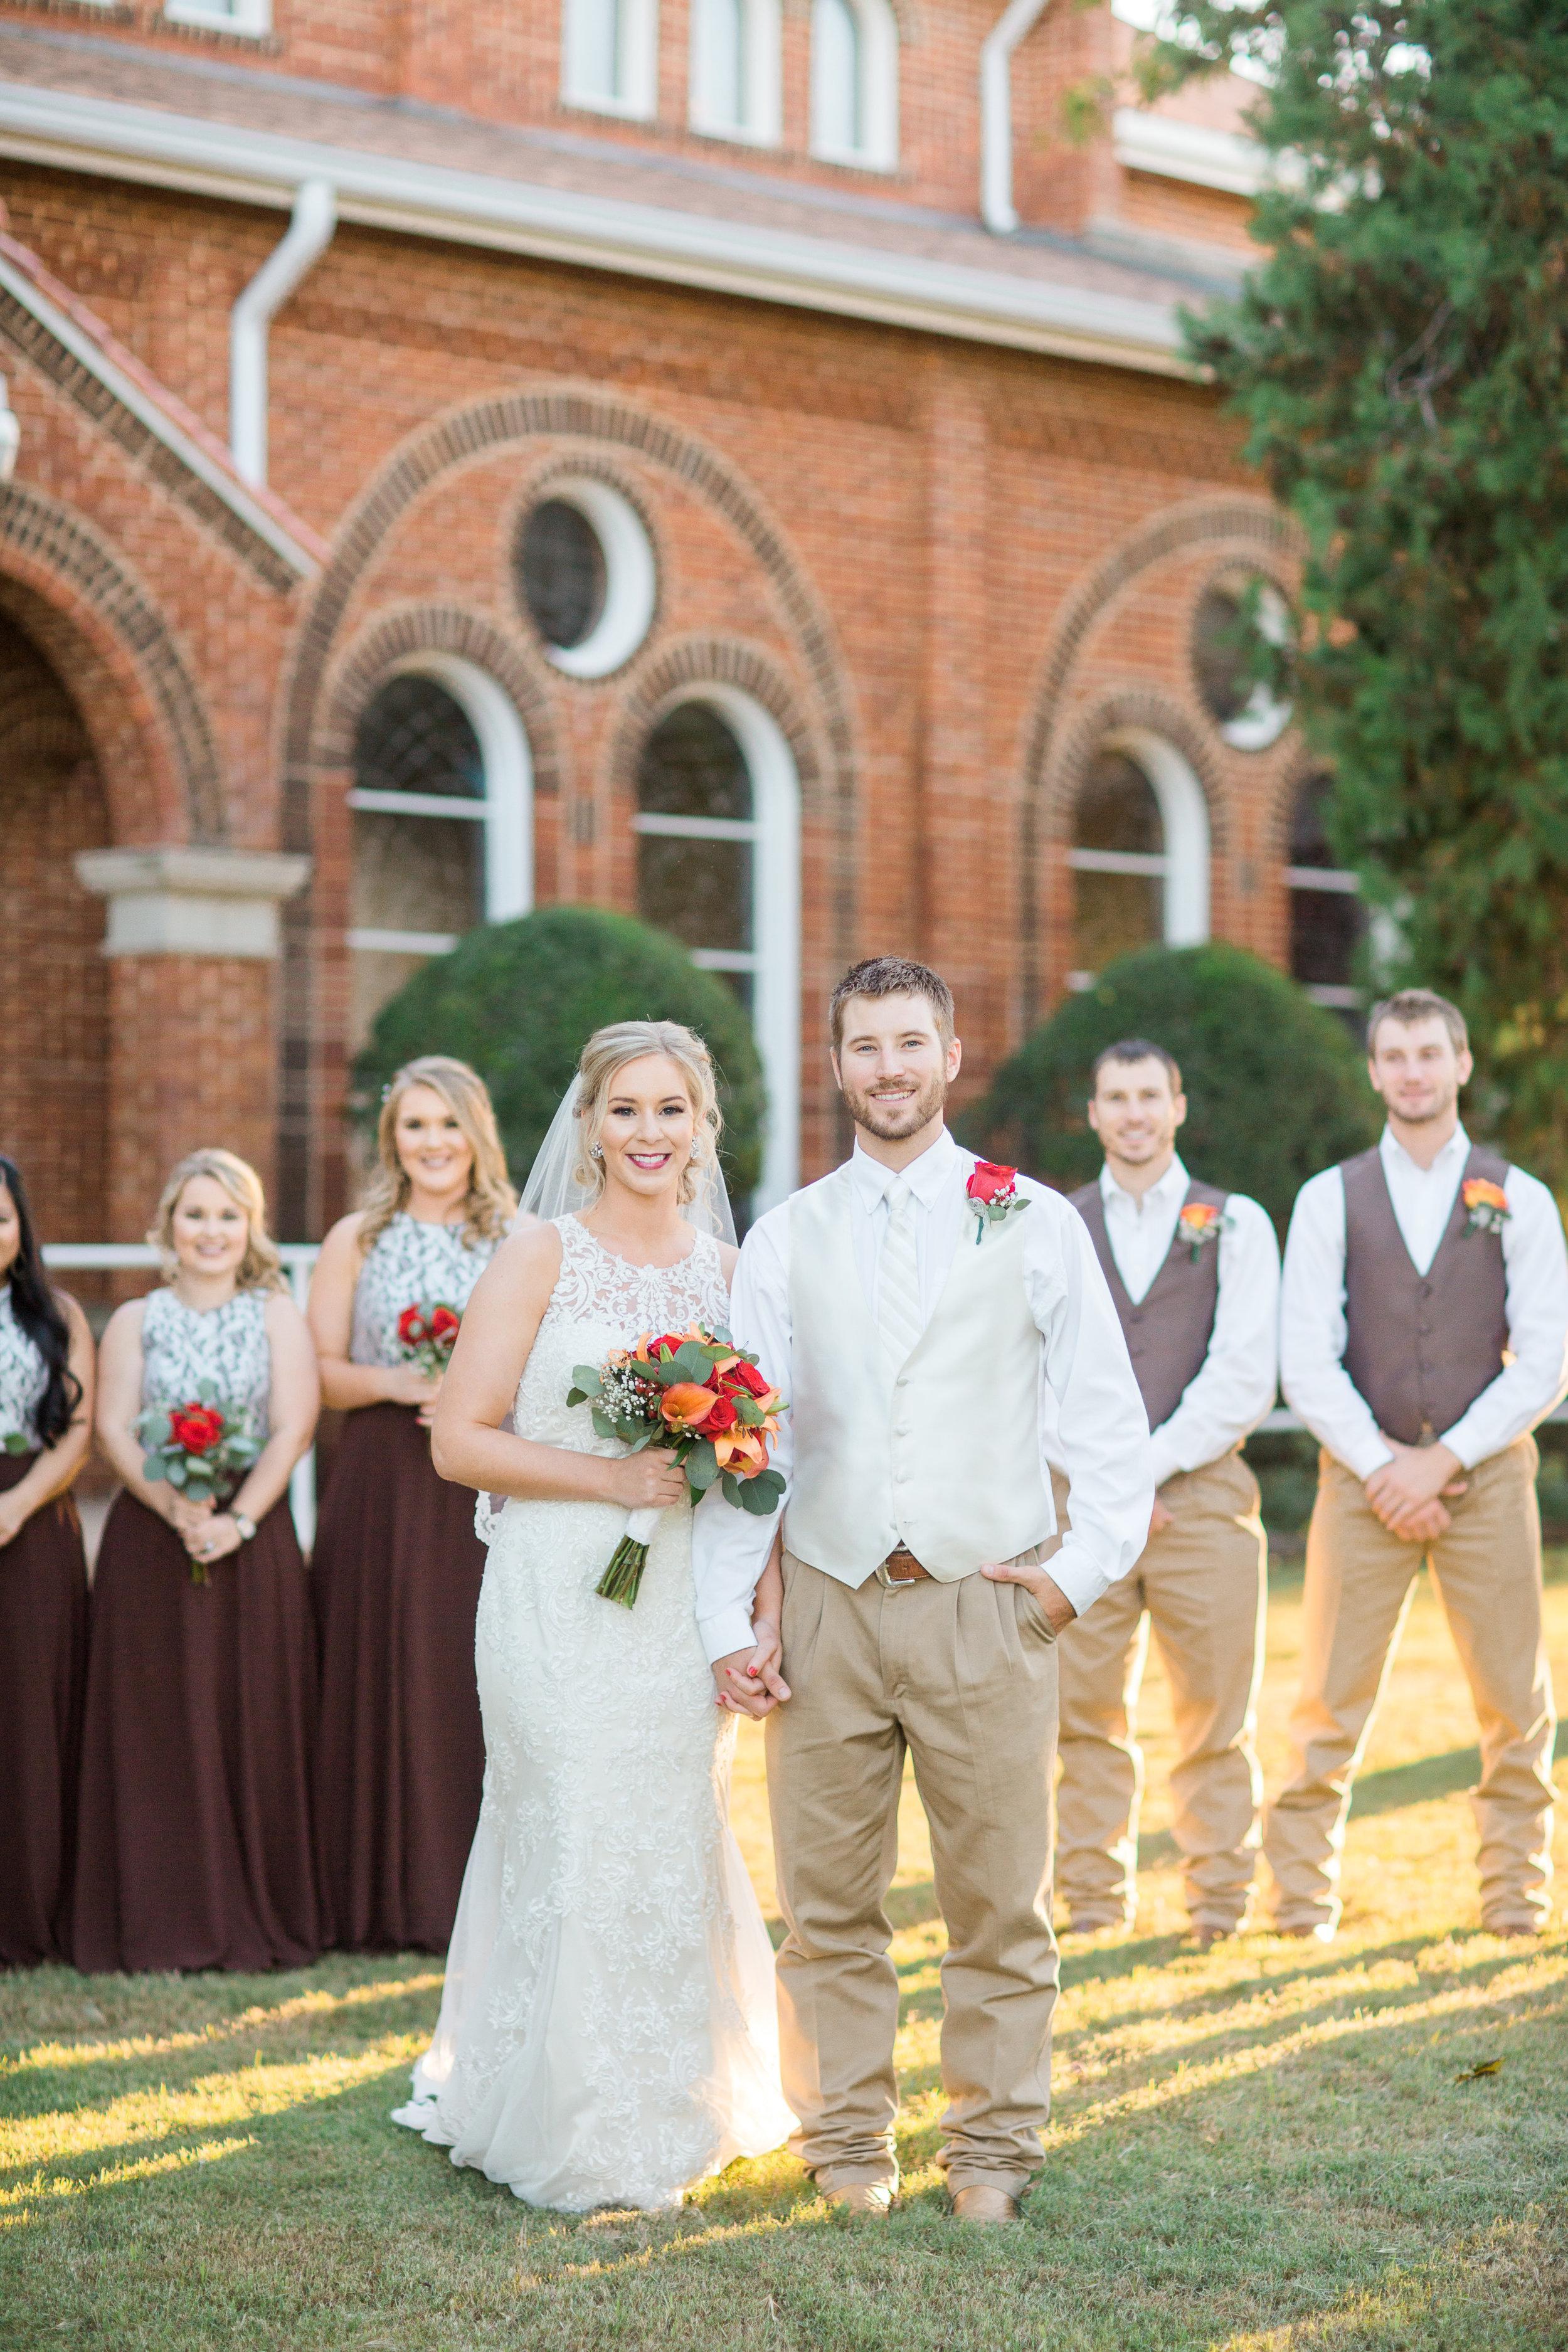 Bailey-Nathan-Windthorst-Texas-Wedding-046.jpg